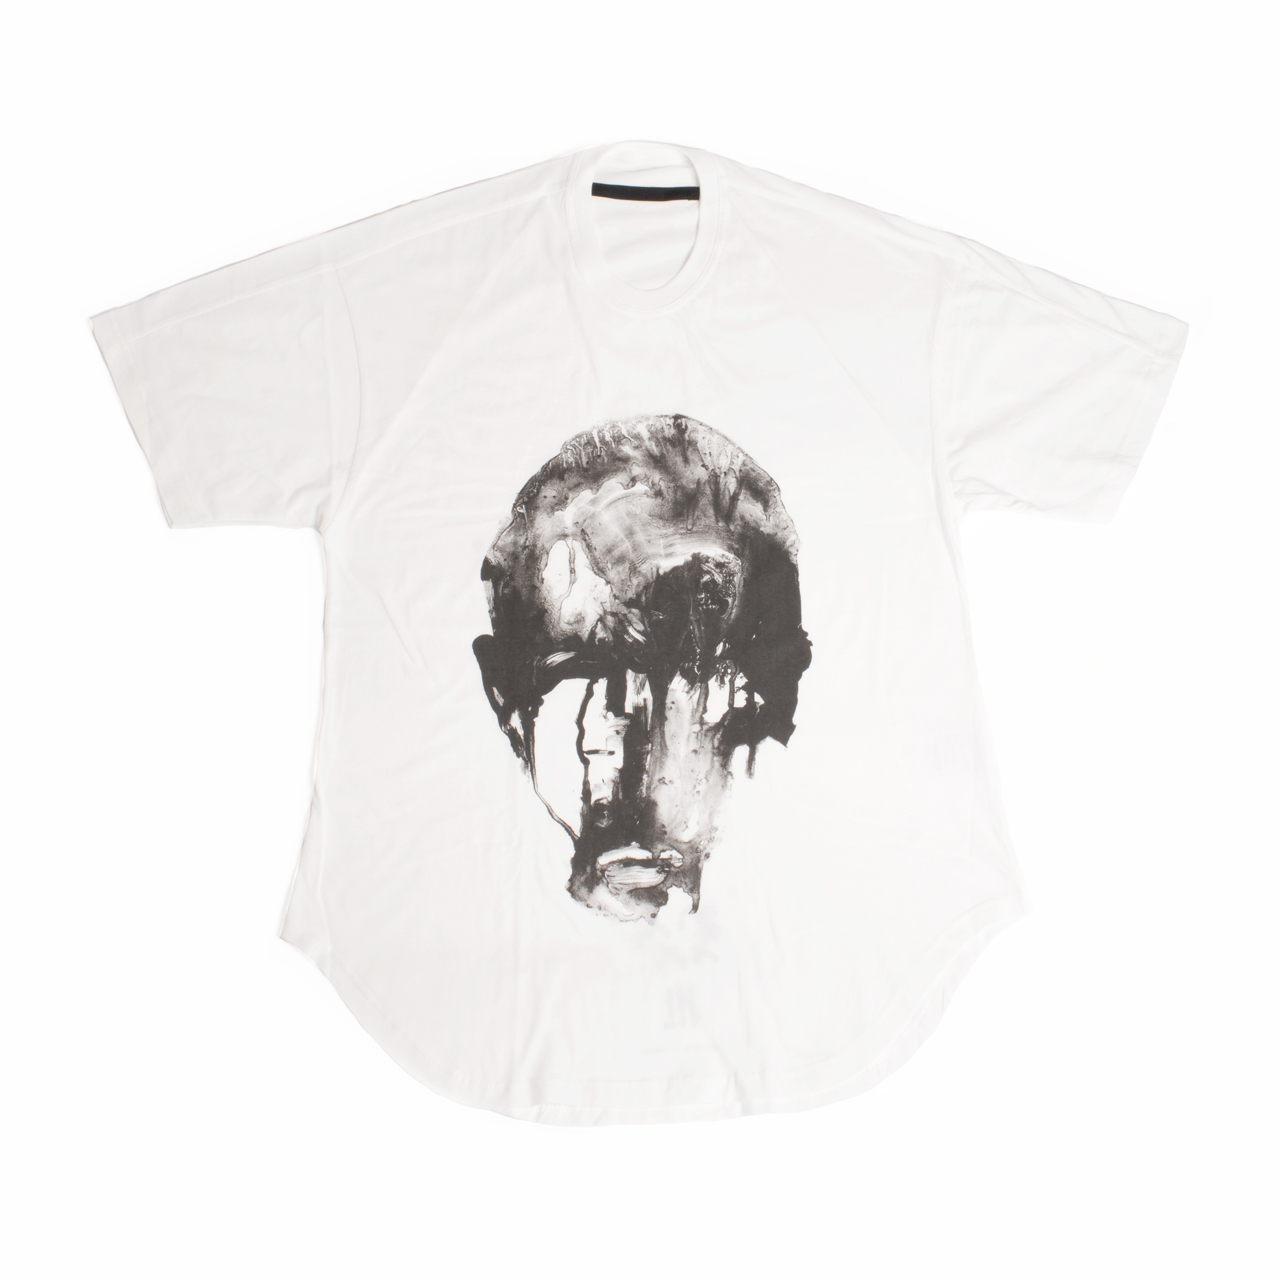 701CPM13-OFF / Jesse Draxler プリント Tシャツ ver.3